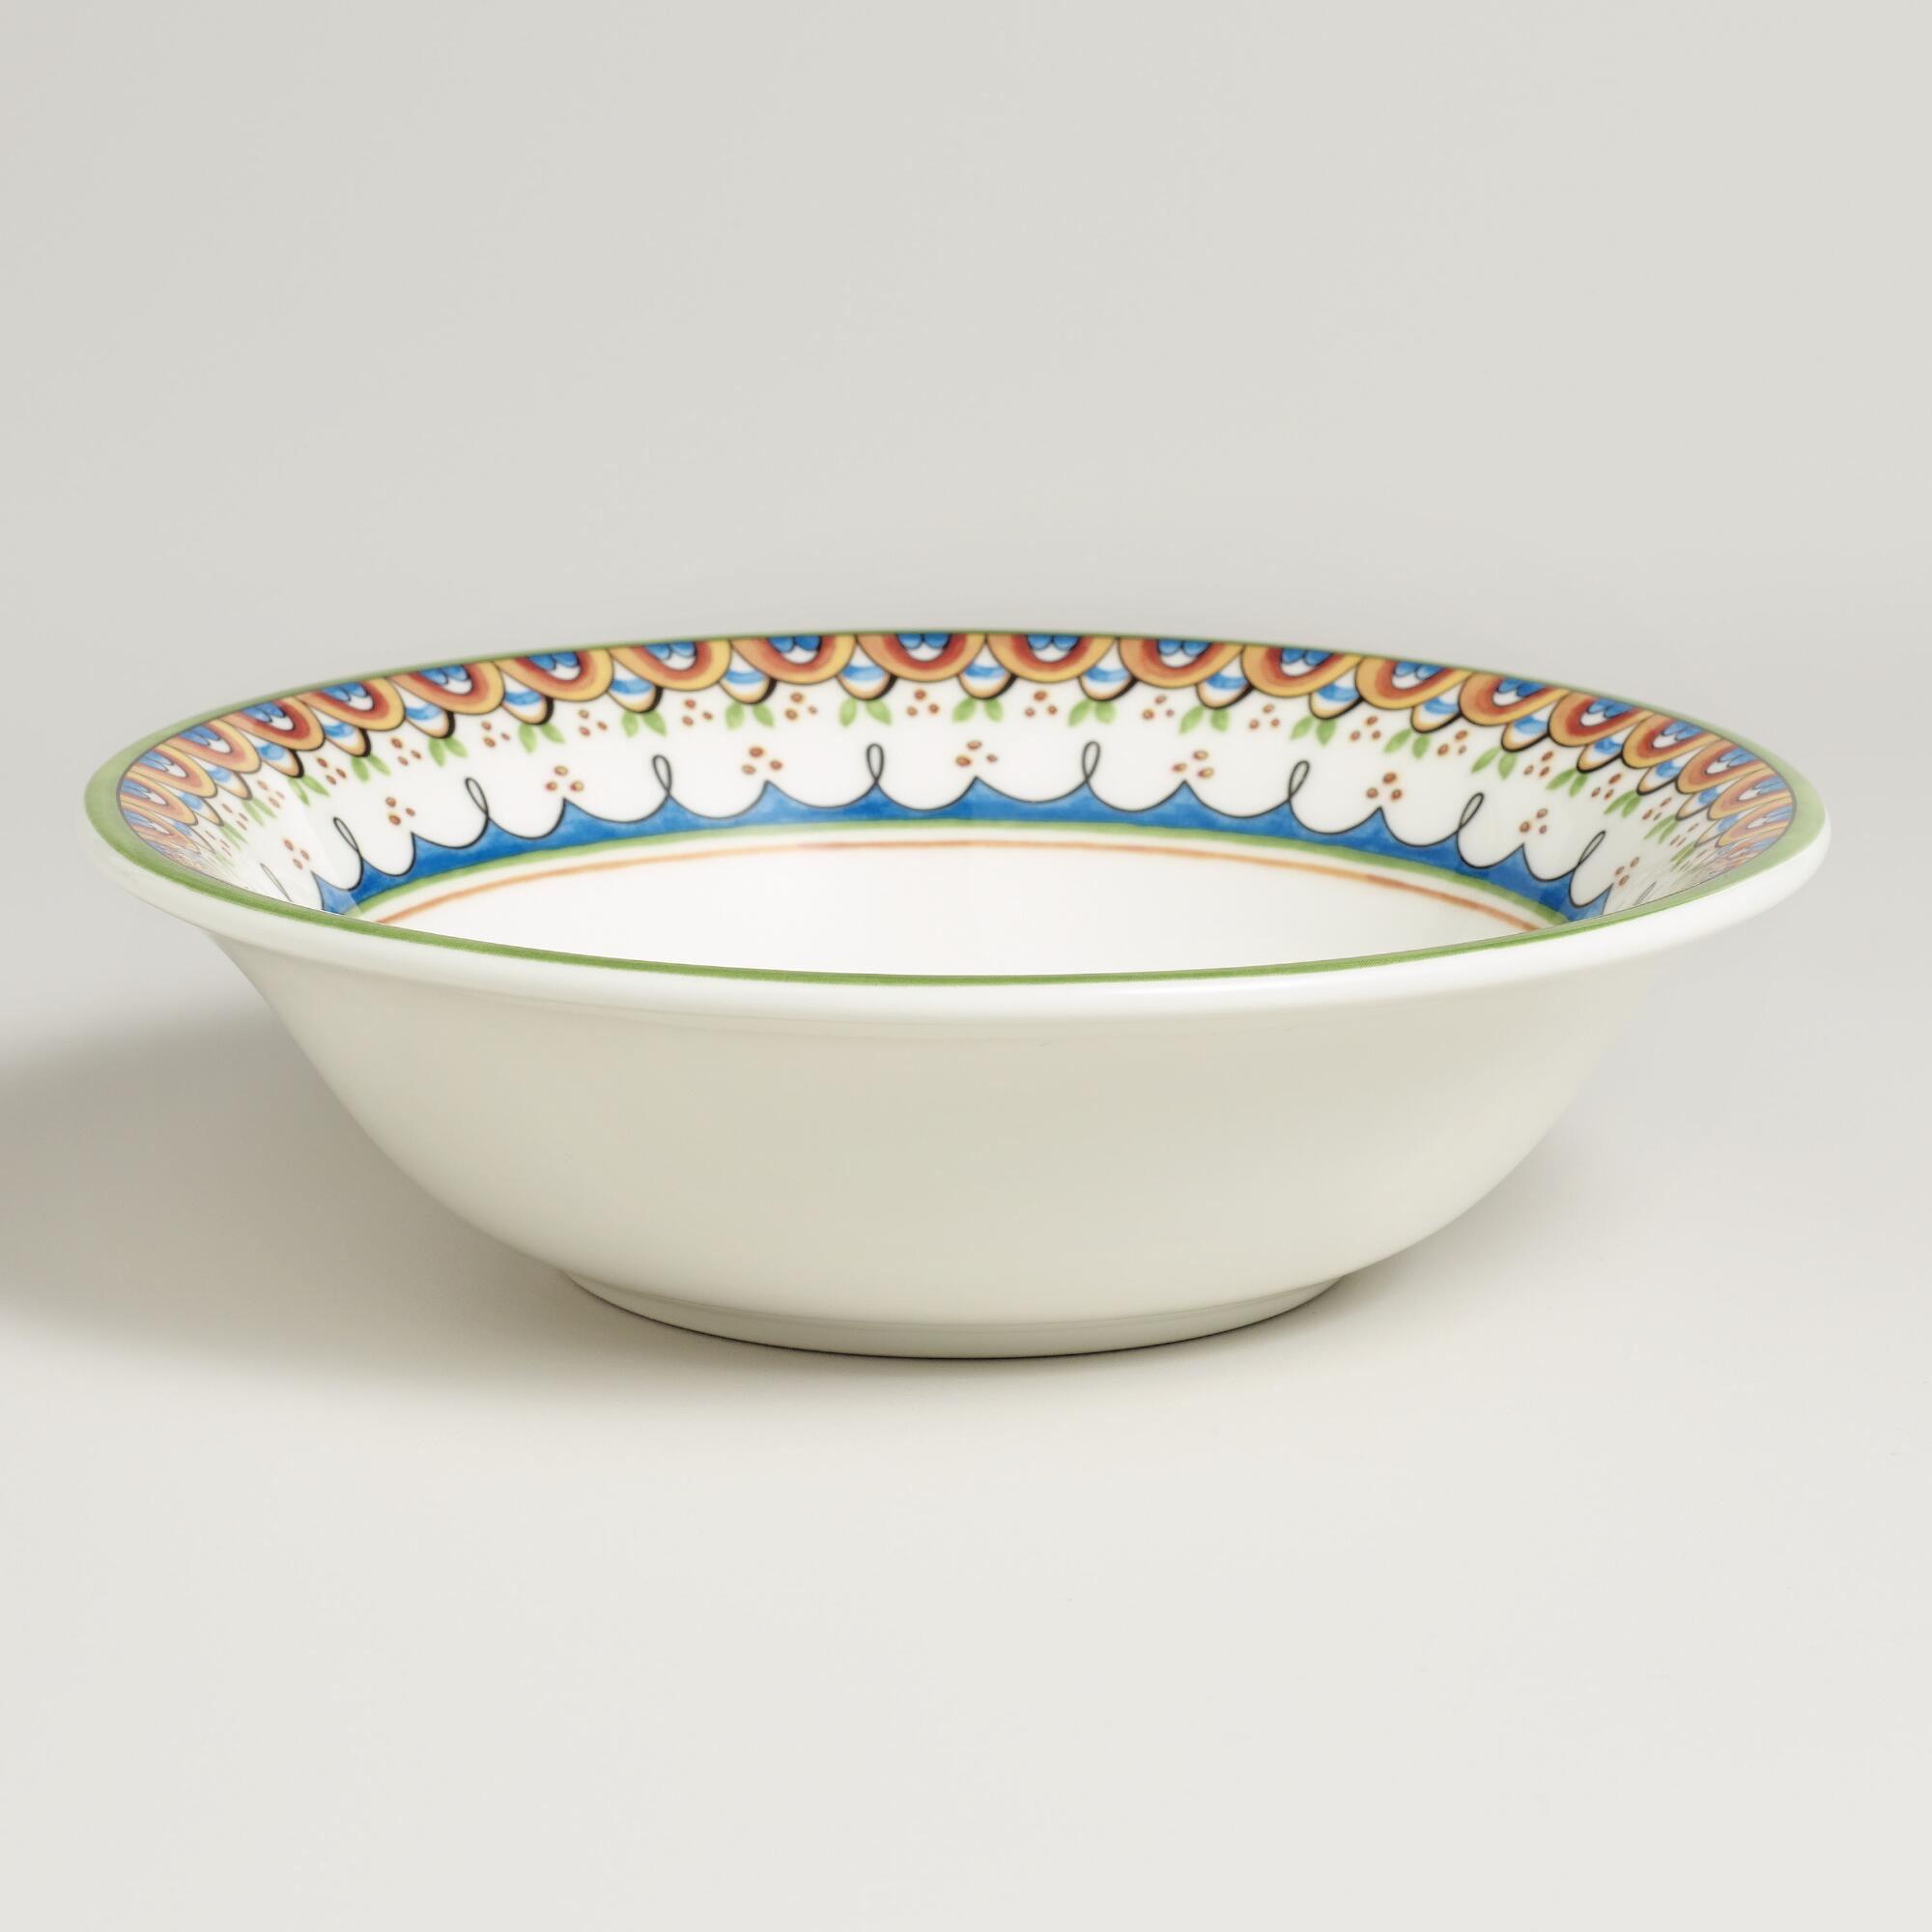 Passaro Cereal Bowls, Set of 4 | World Market